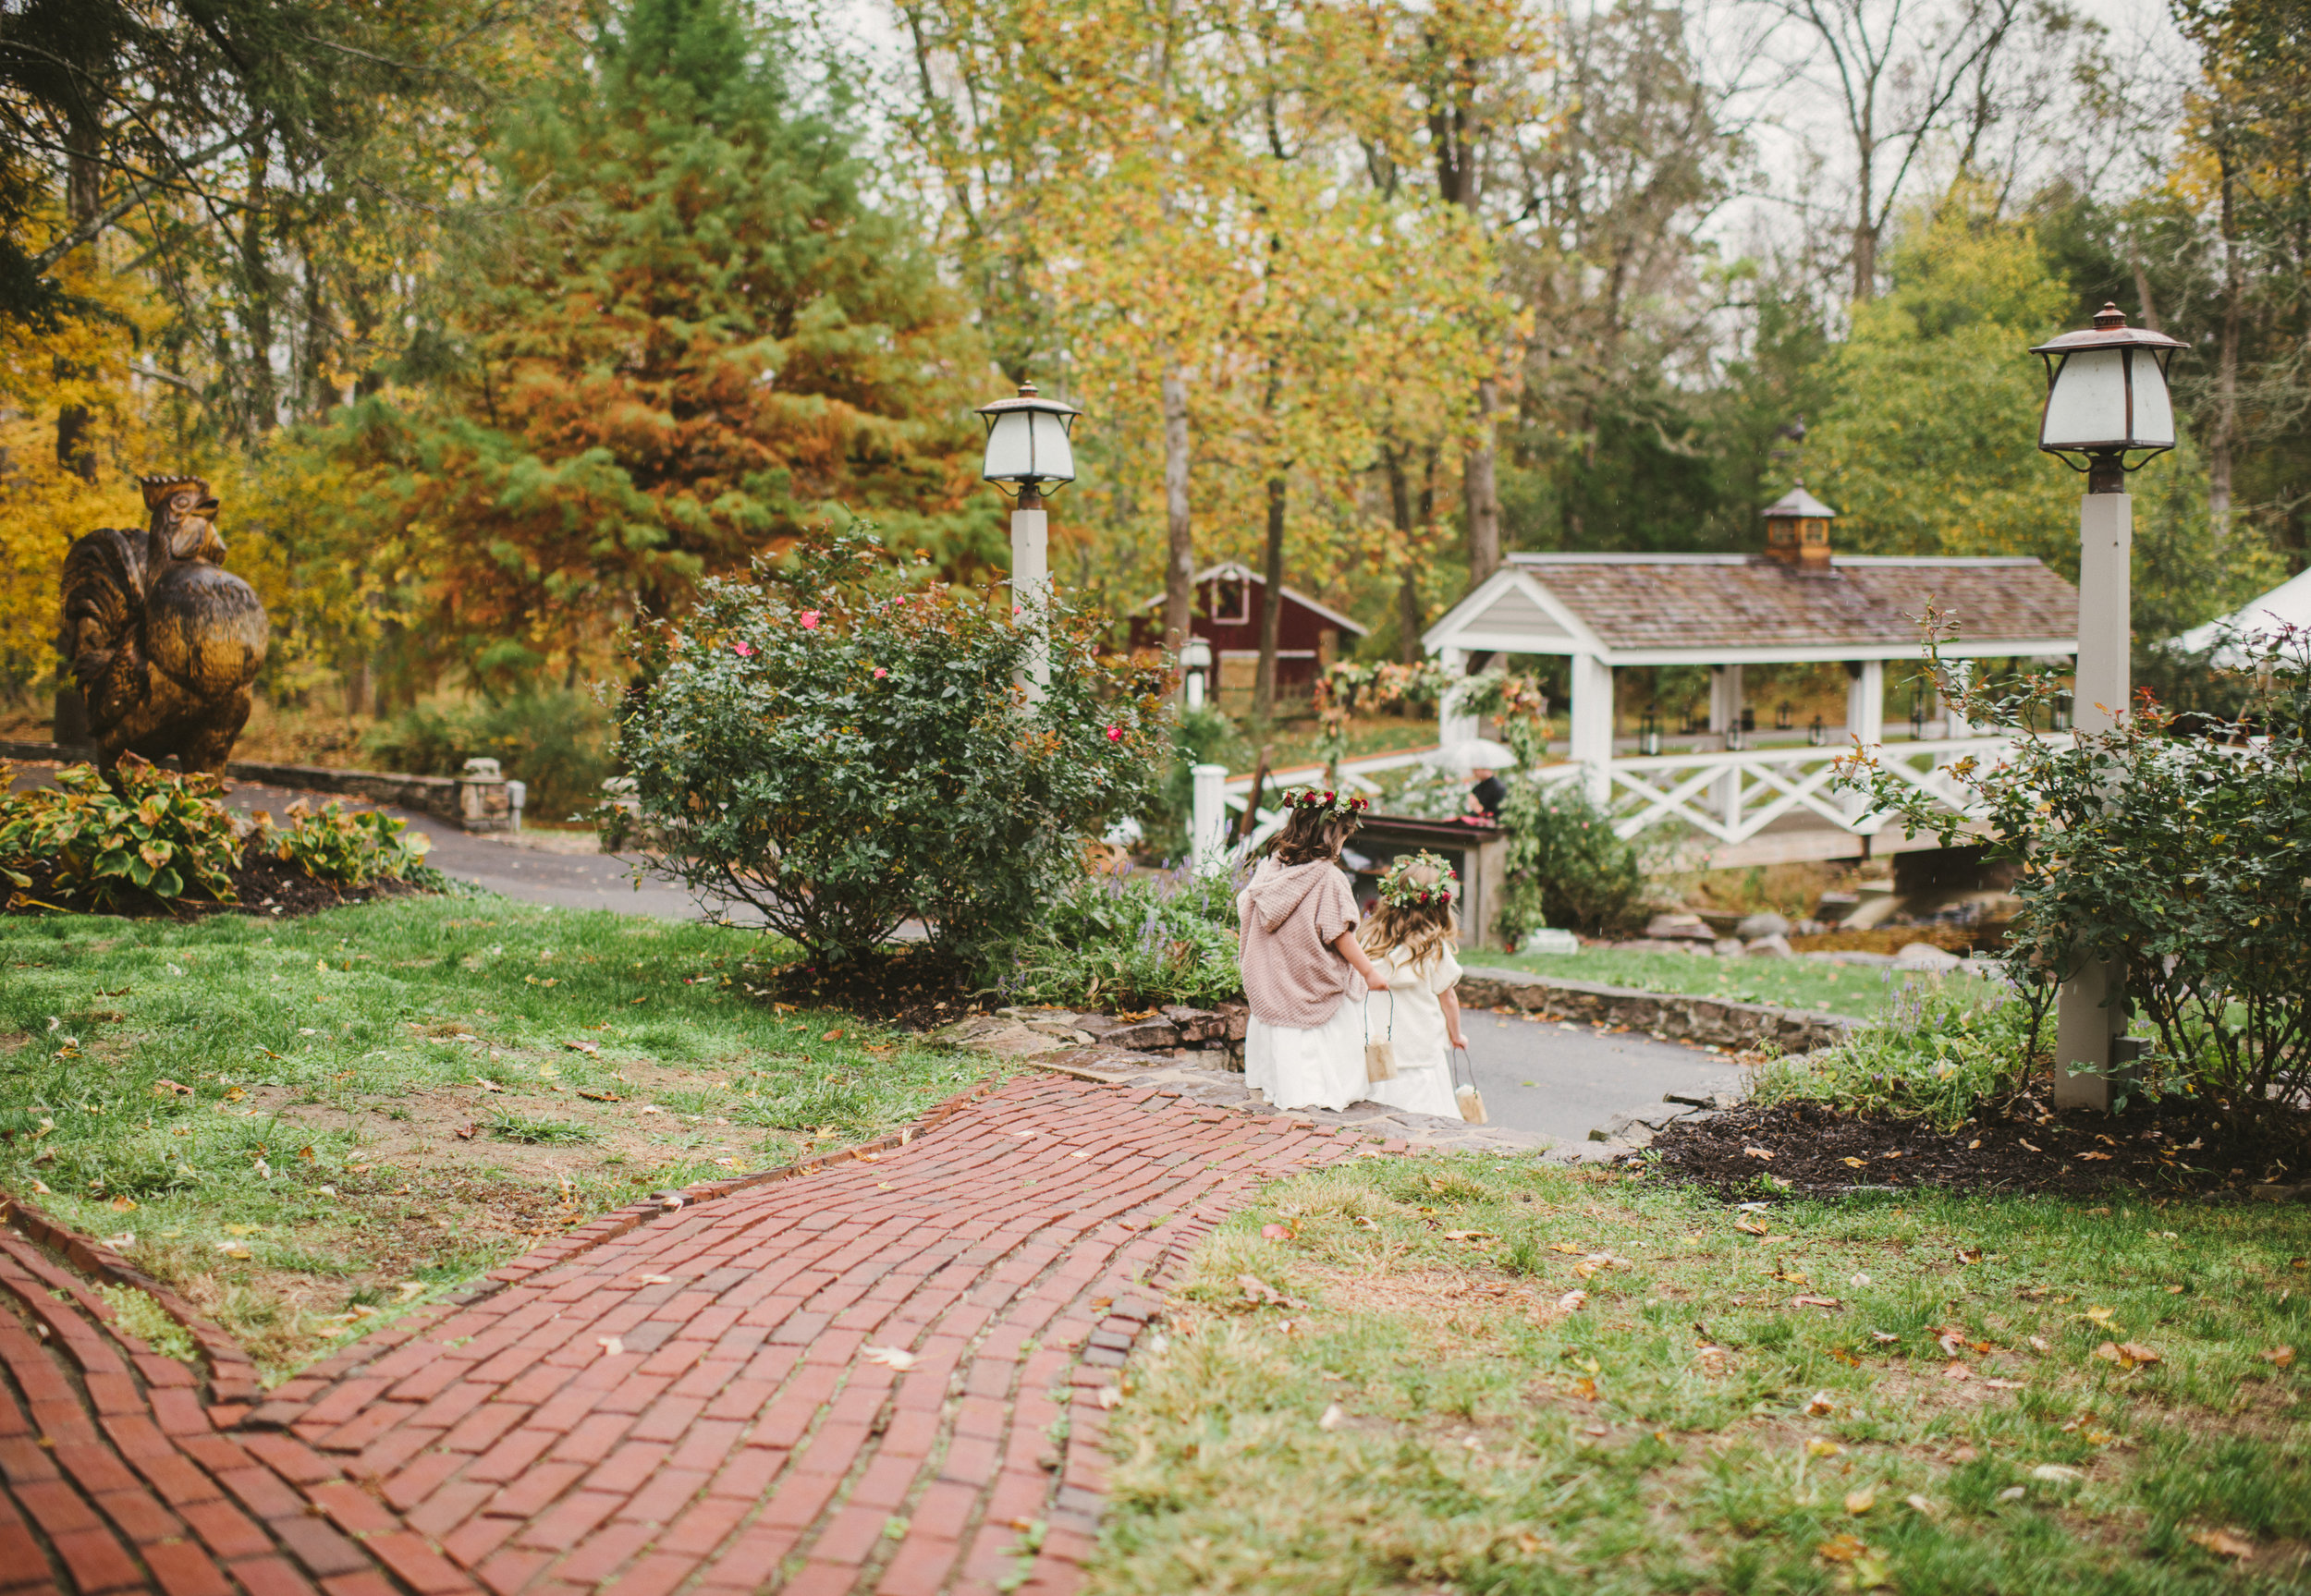 JACQUELINE & ANDREW WARSHAWER -BROOKMILL FARM FALL WEDDING - INTIMATE WEDDING PHOTOGRAPHER - TWOTWENTY by CHI-CHI AGBIM-205.jpg